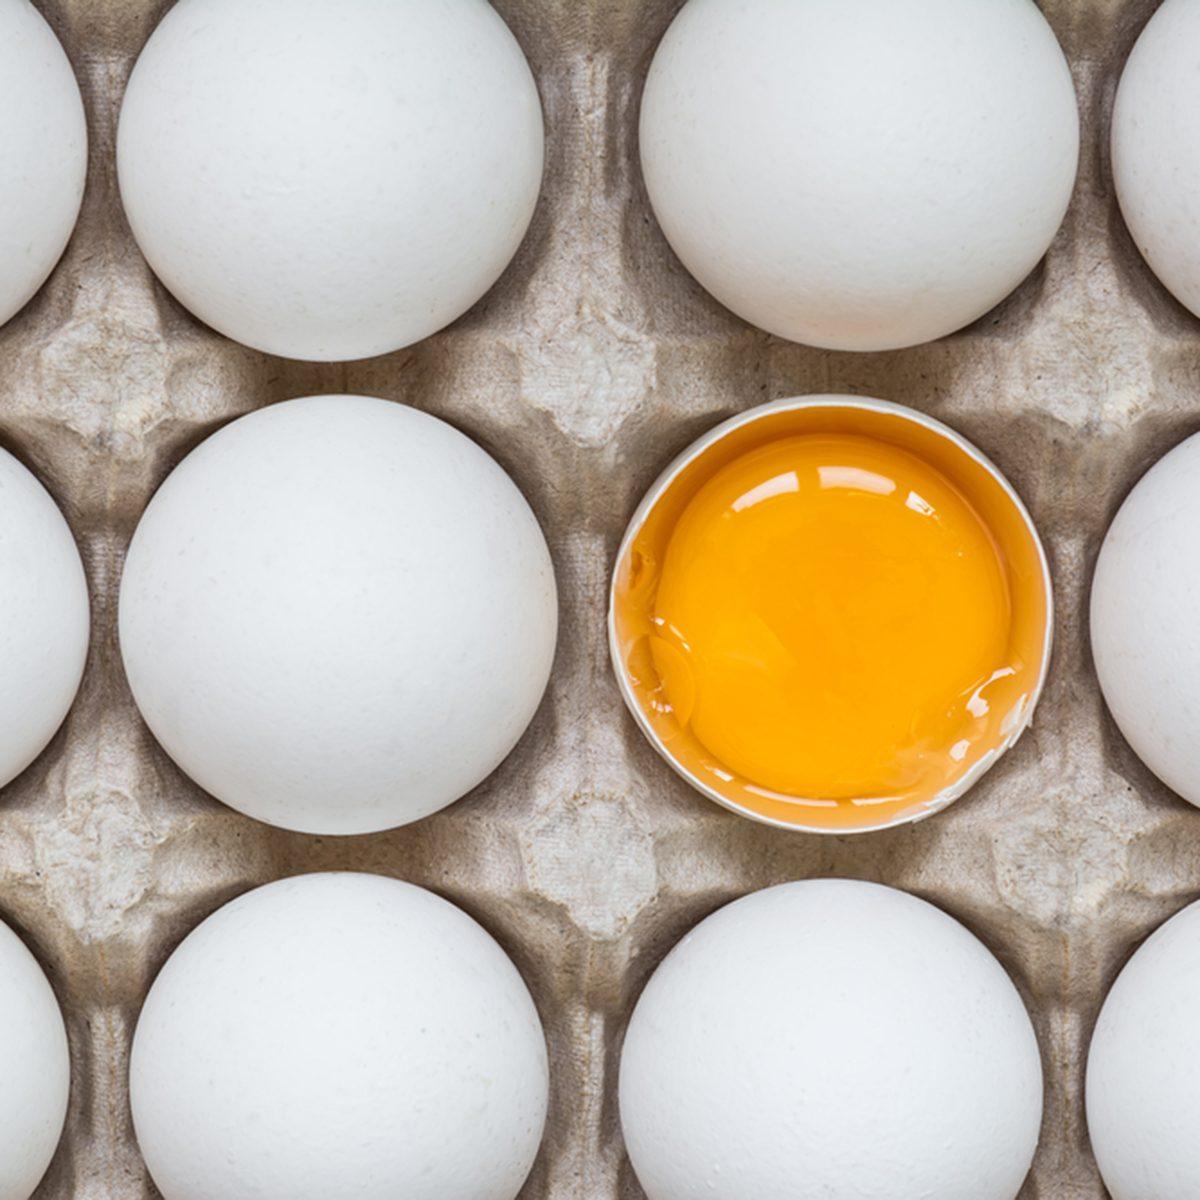 Chicken egg is half broken among other eggs